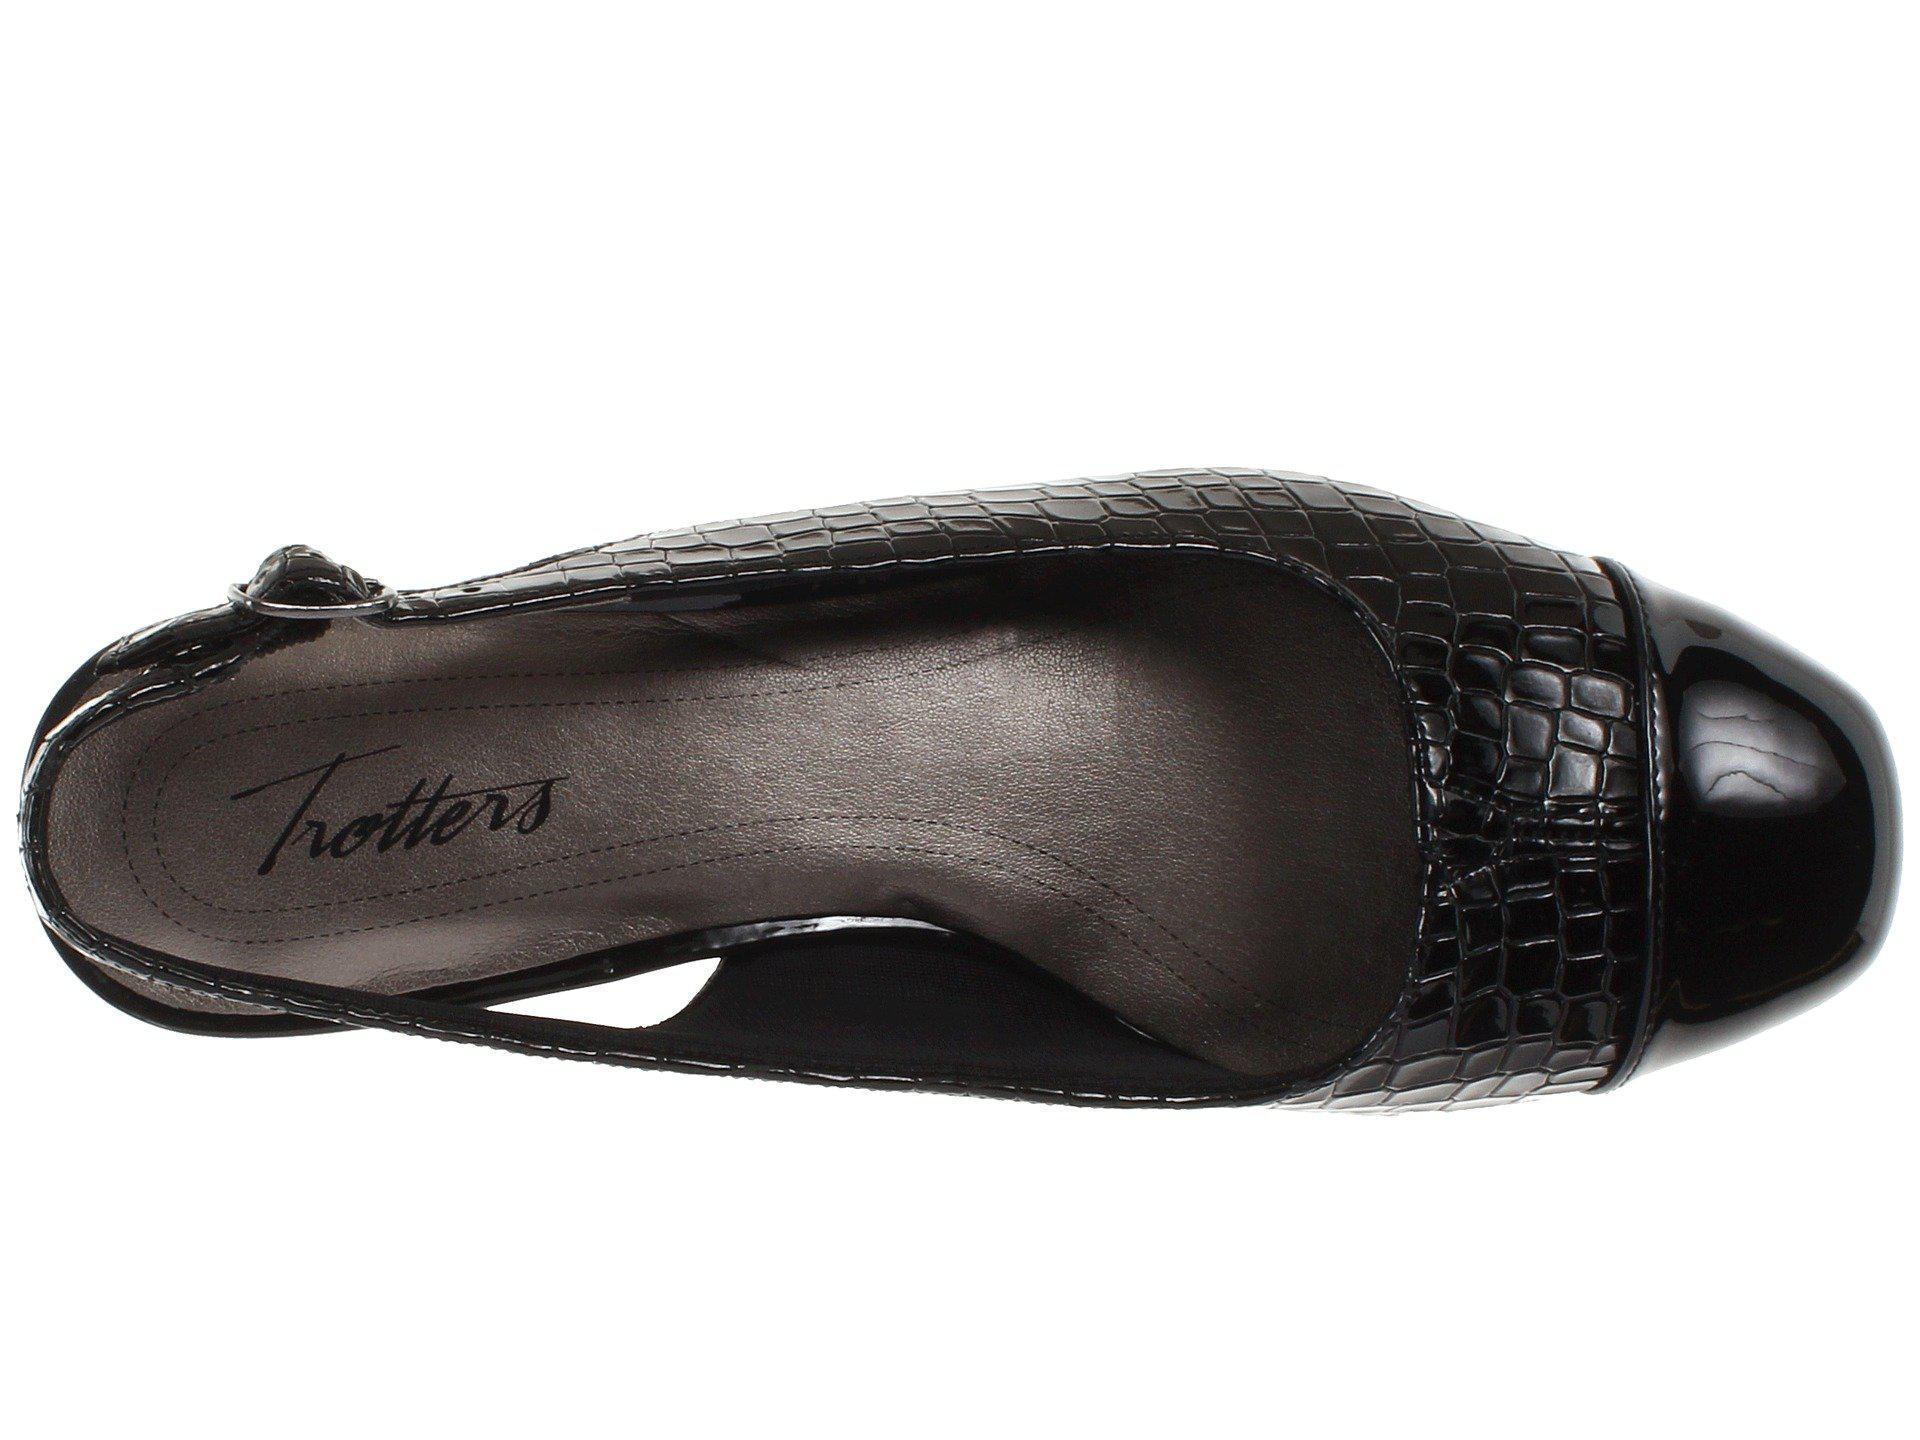 b730528486e Trotters - Dea (black Patent black Leather) Women s 1-2 Inch Heel. View  fullscreen